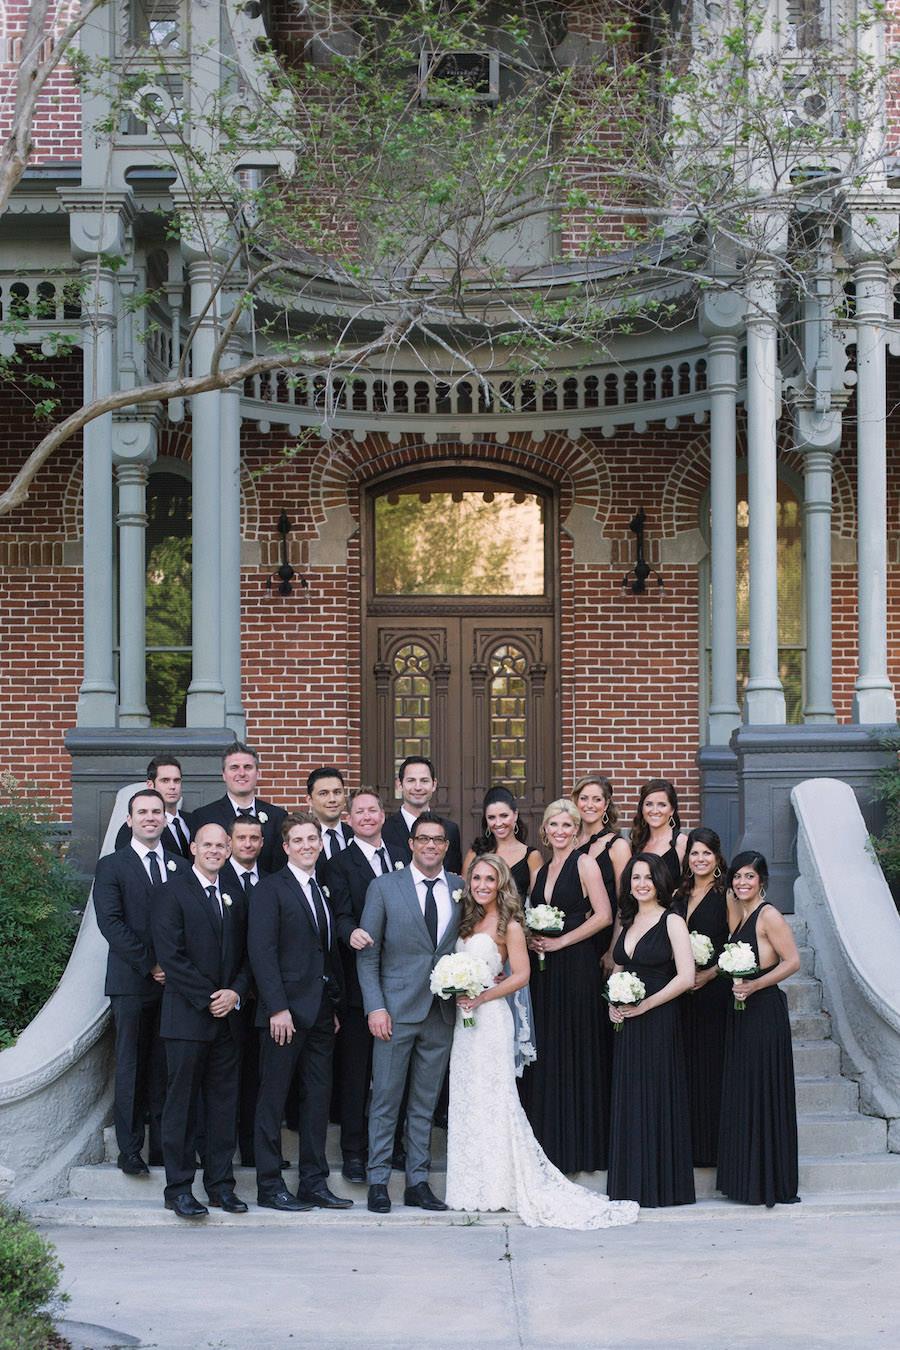 Outdoor Wedding Portrait with Bridal Party   Black Bridesmaids Dress and Black Groomsmen Suits   Tampa Bella Bridesmaids